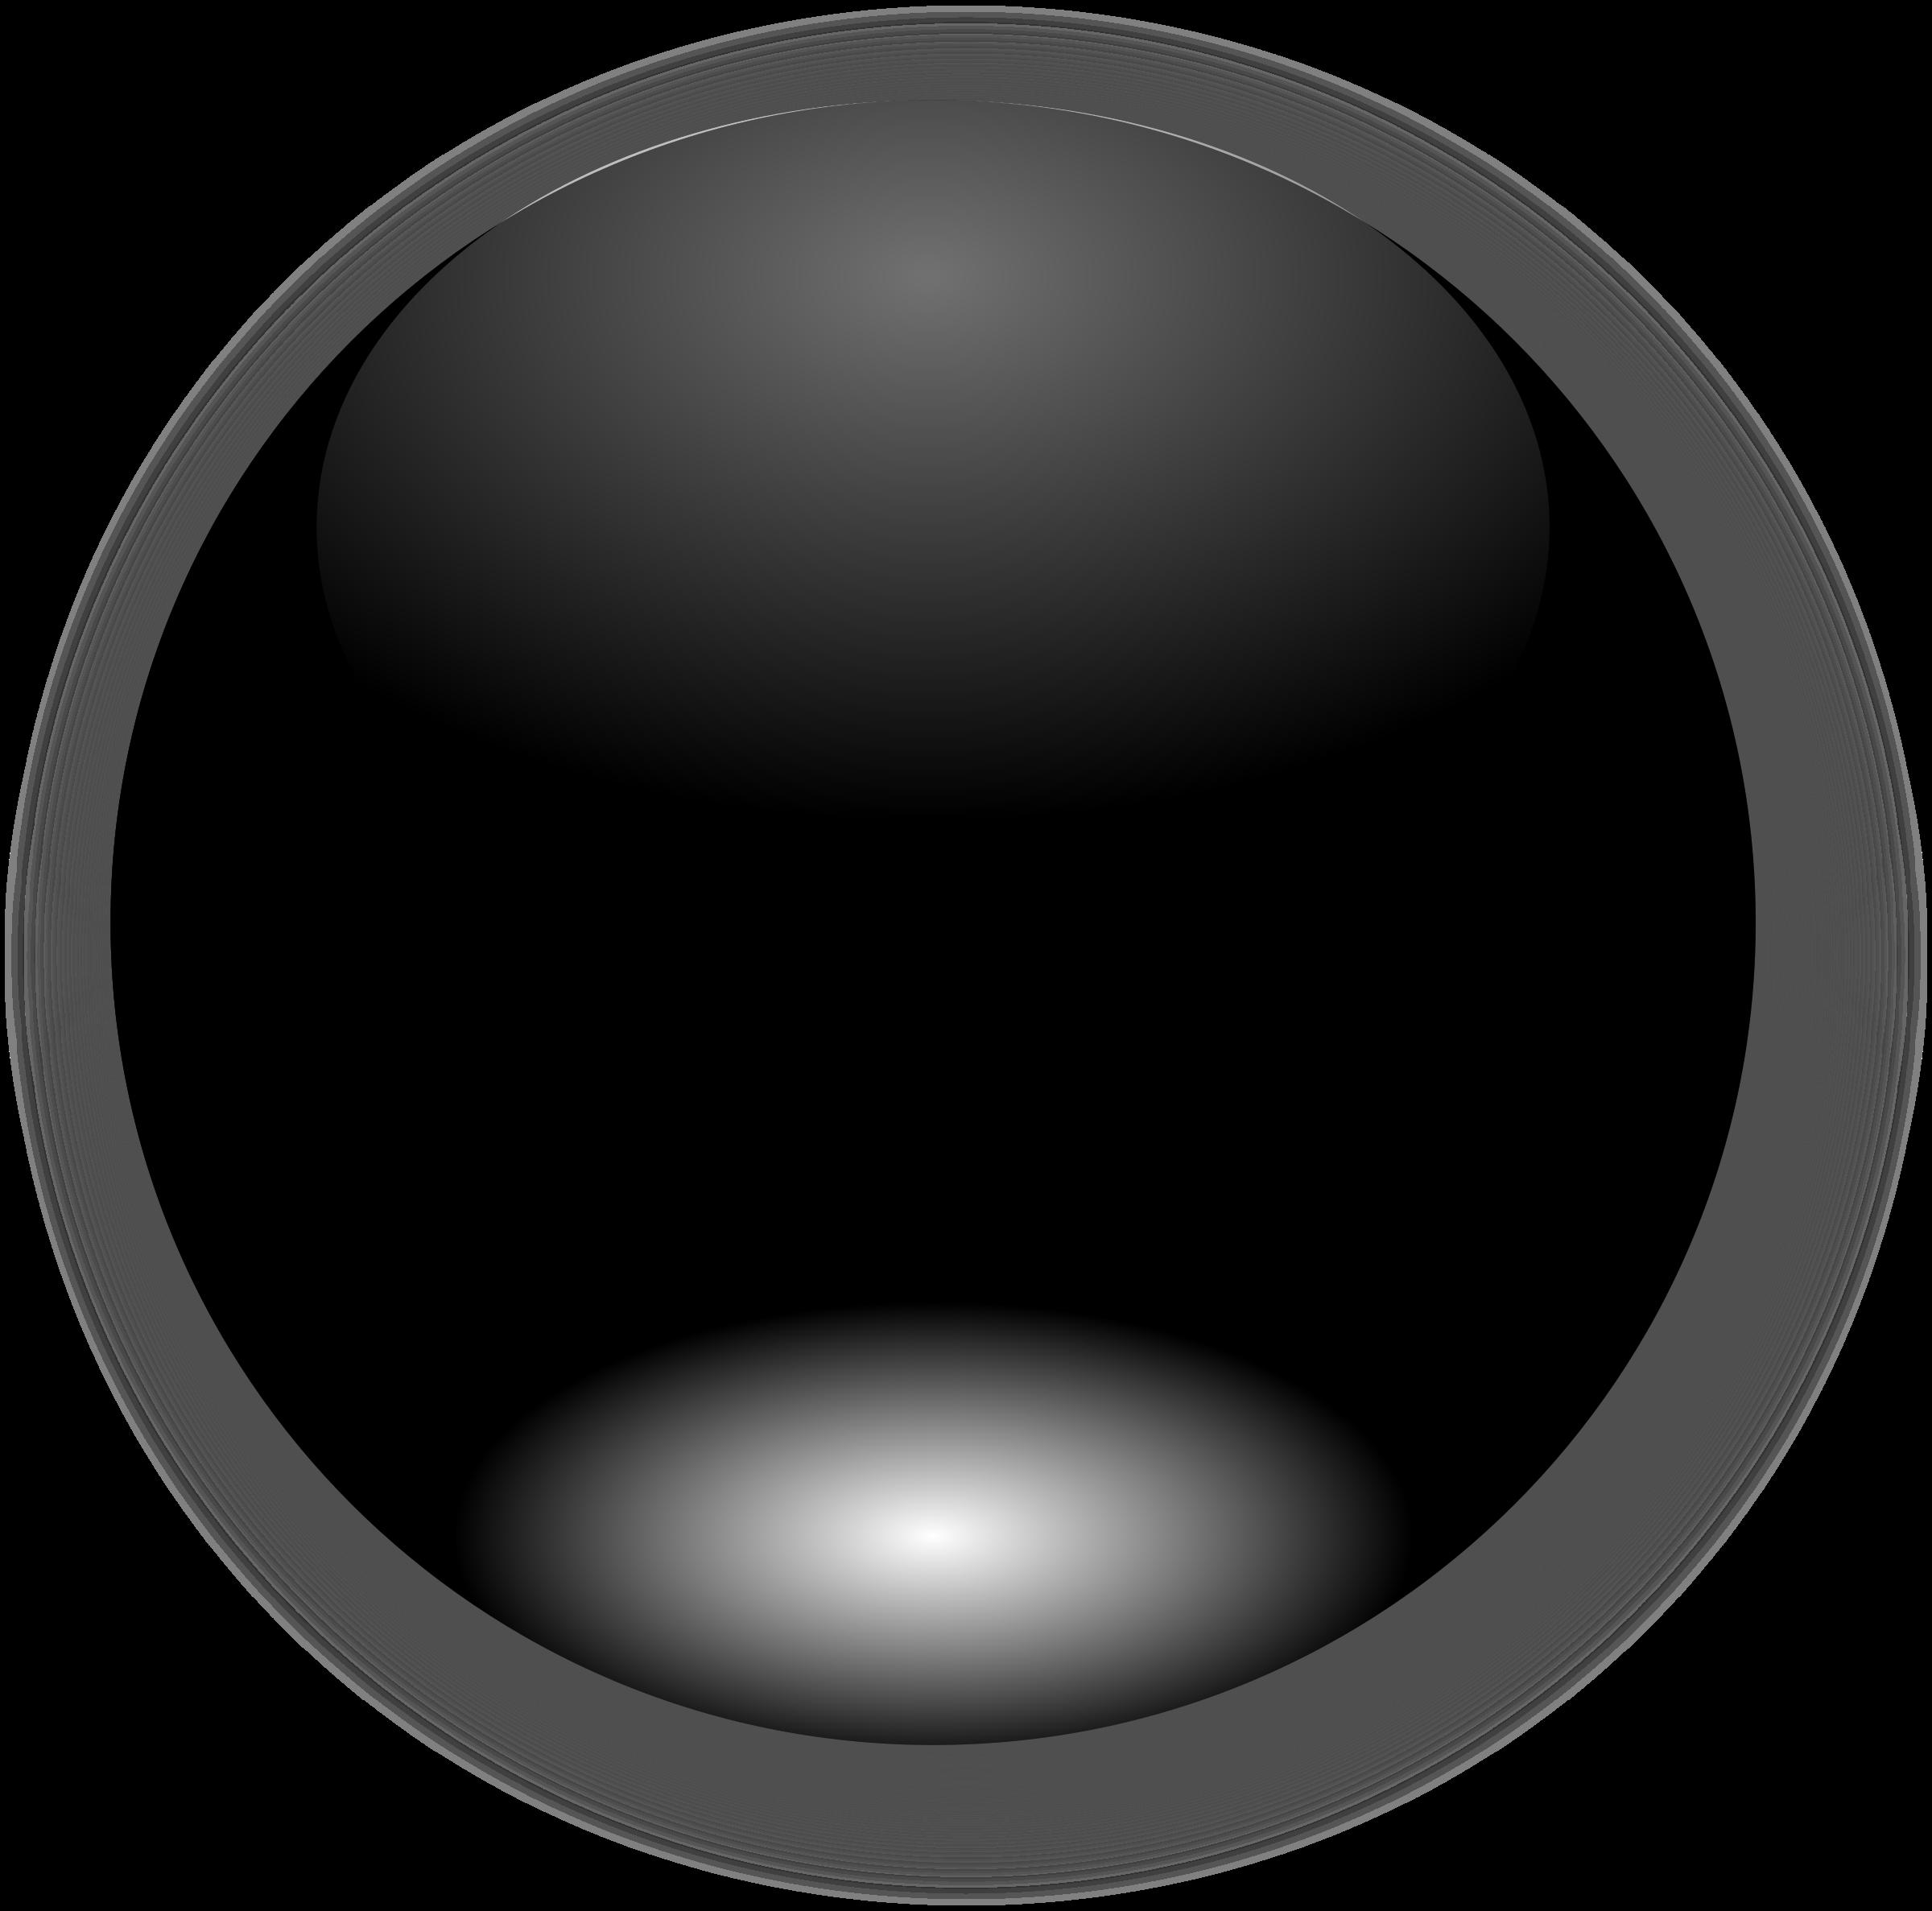 Black button big image. Pin clipart round